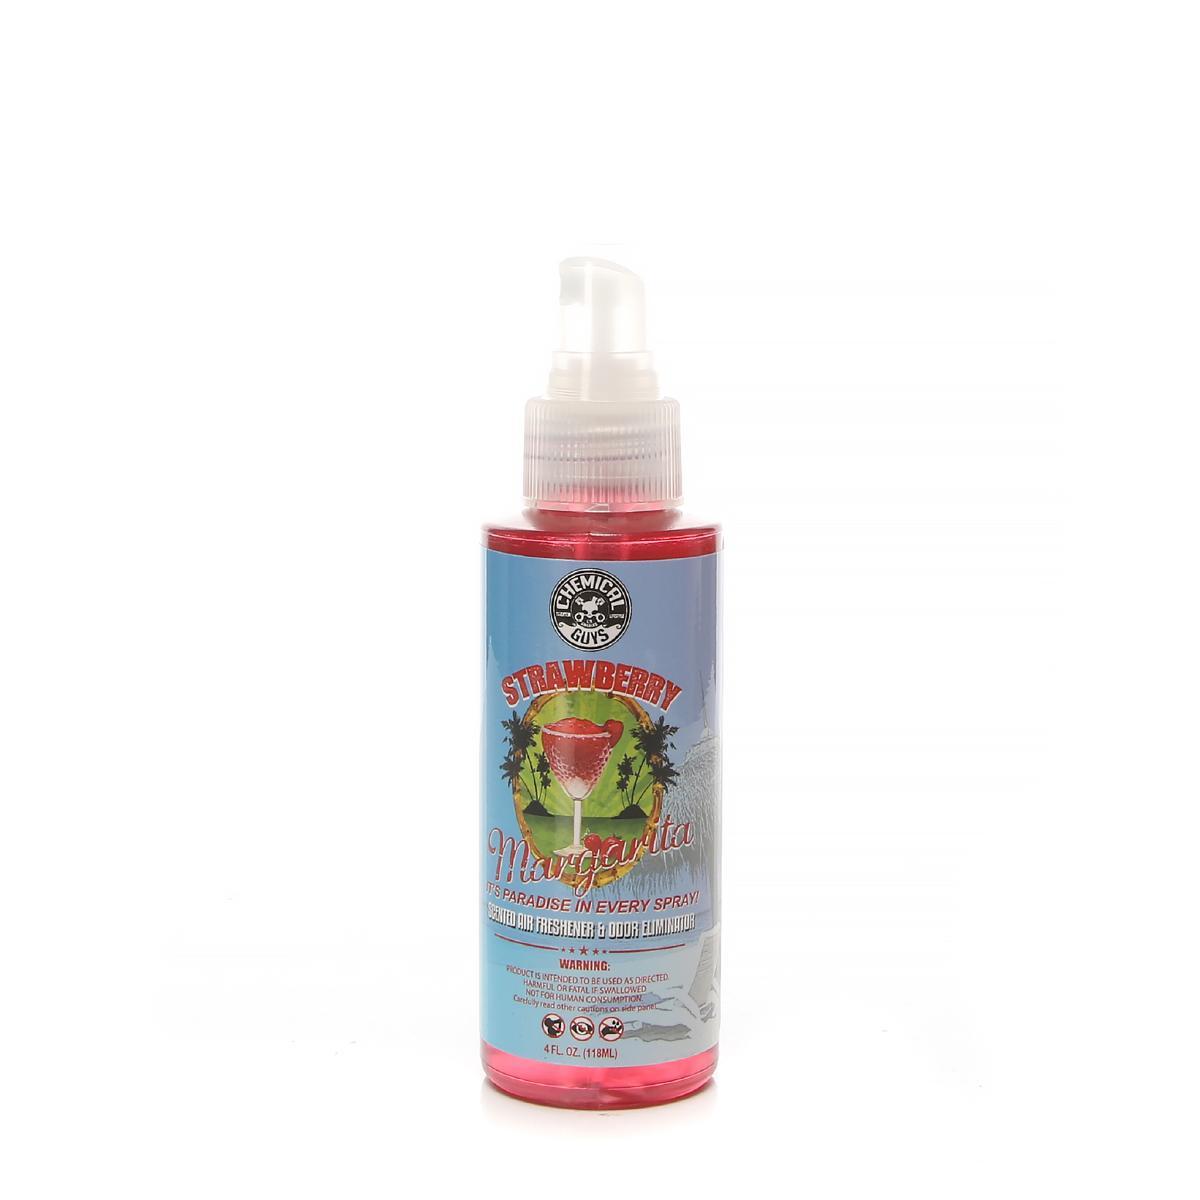 Luktborttagare Chemical Guys Strawberry Margarita, 118 ml